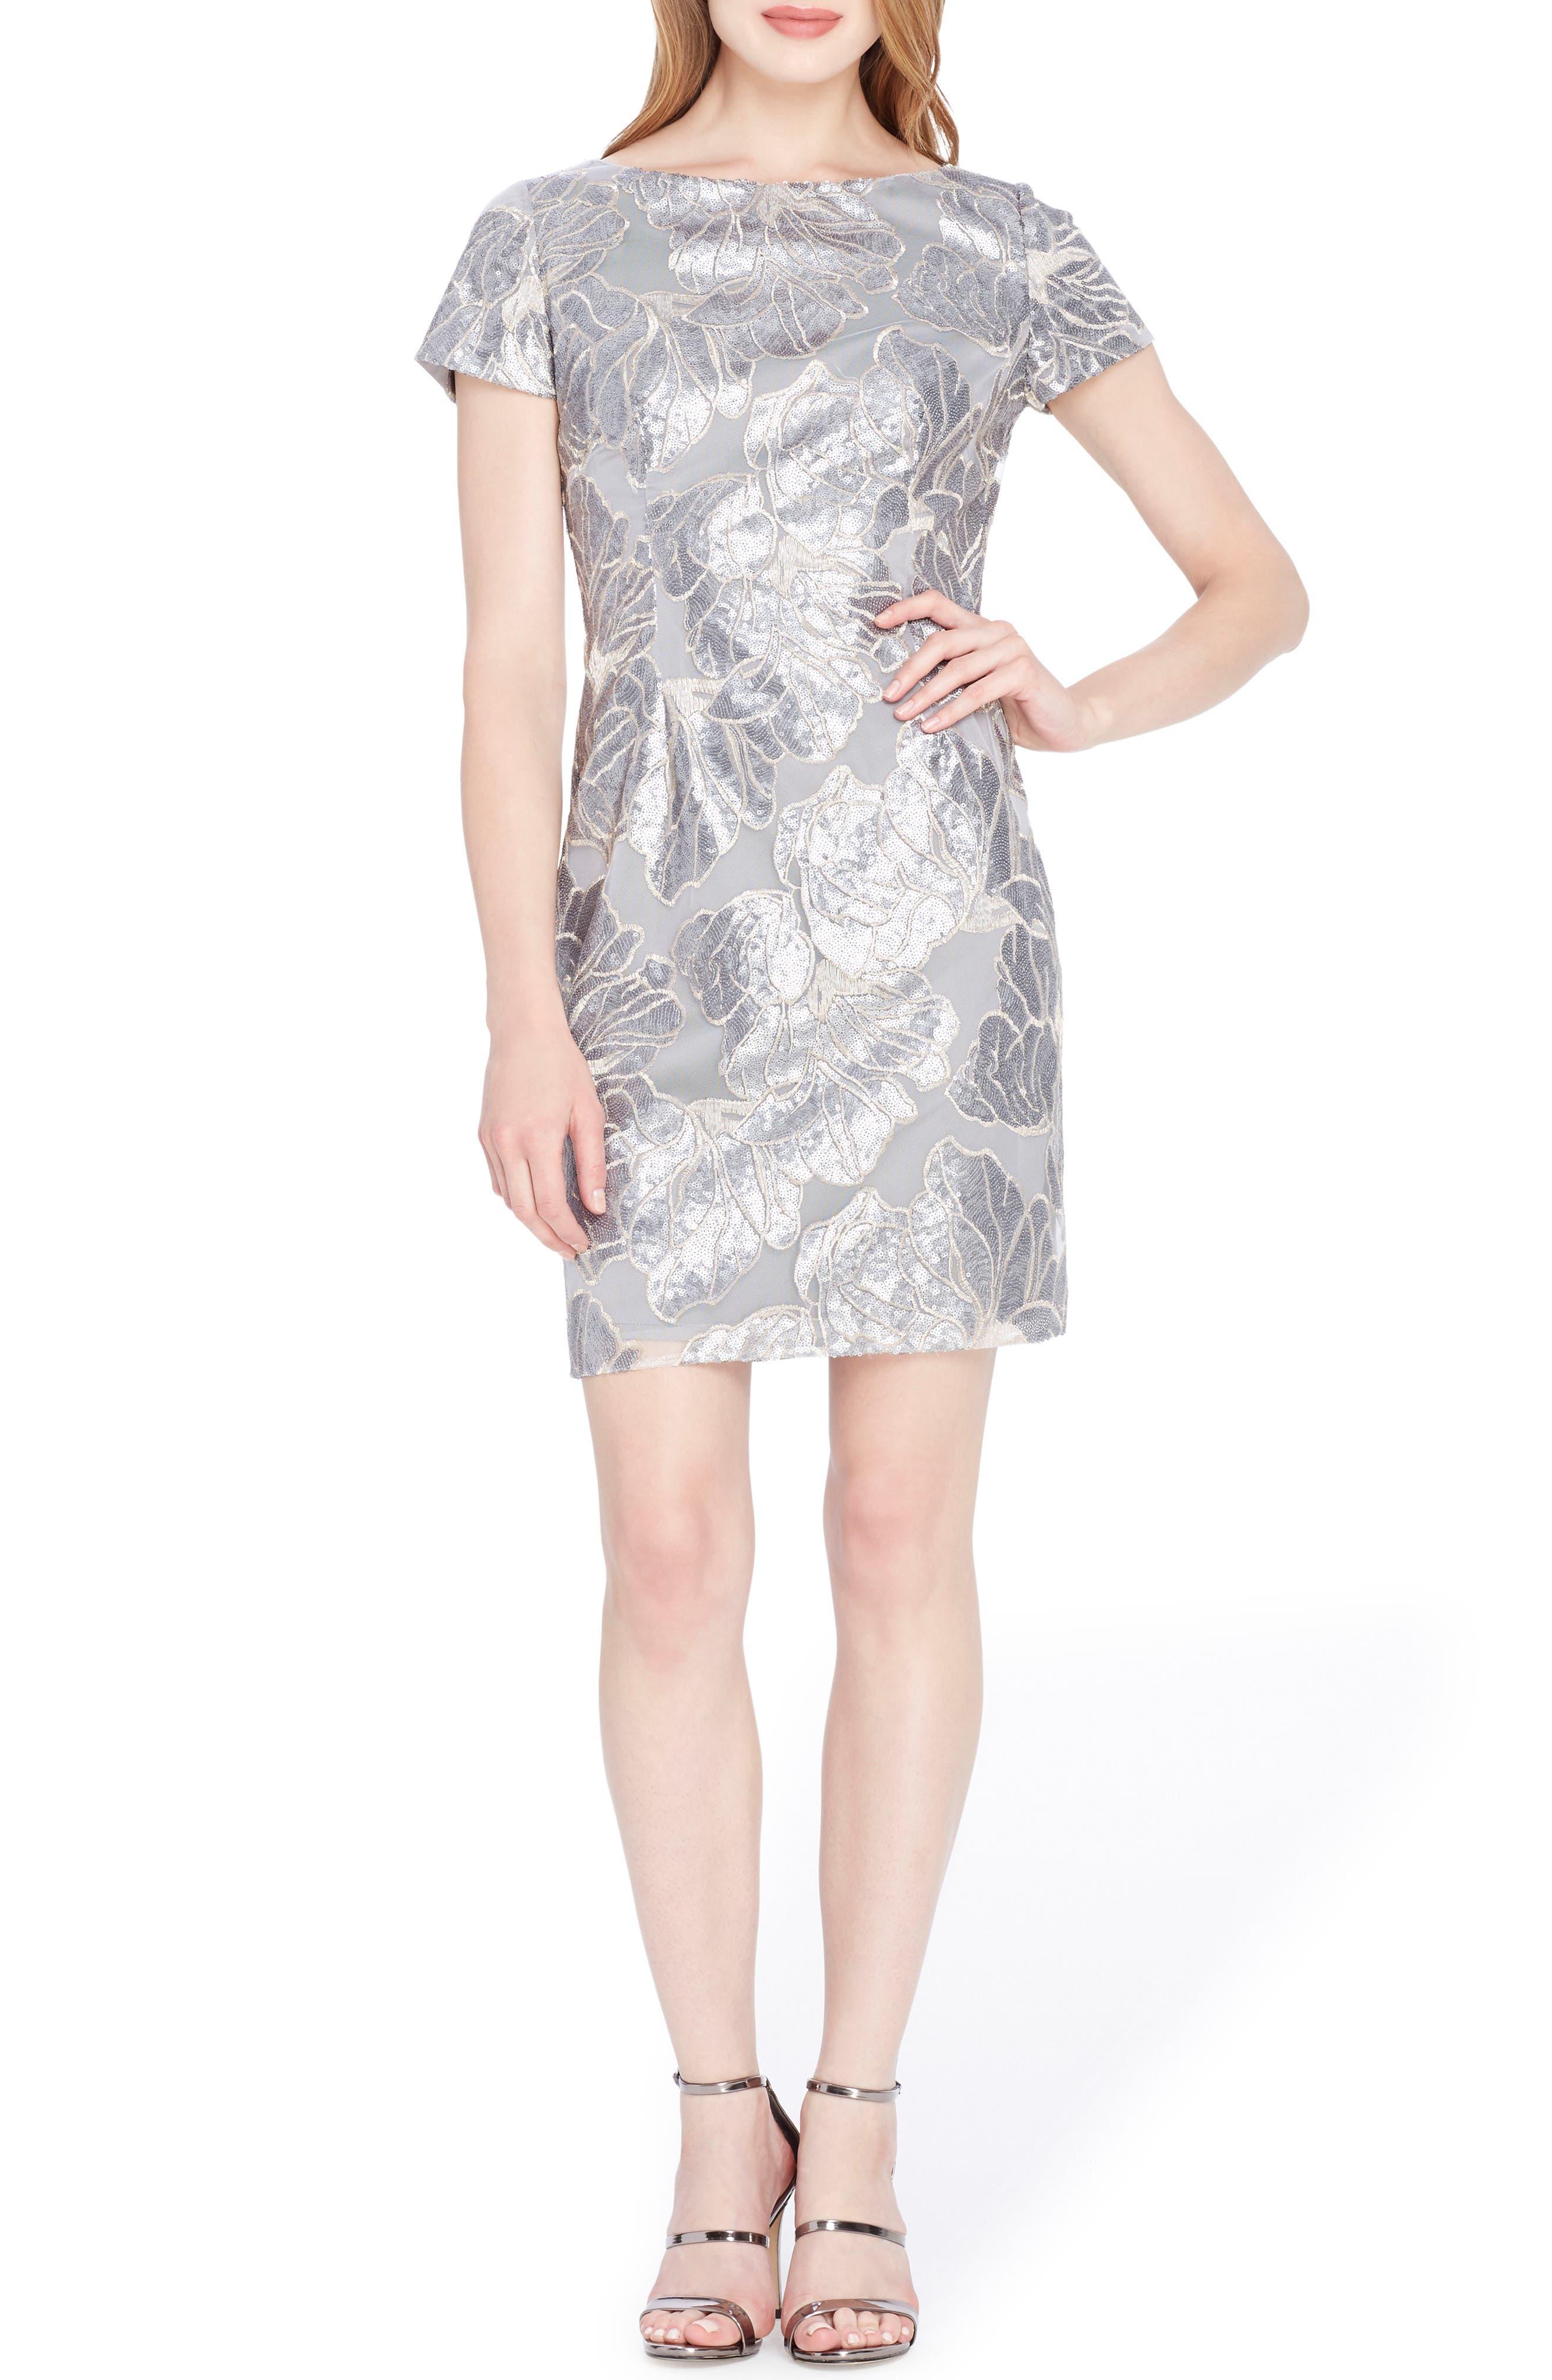 Tahari Sequin Floral Sheath Dress (Petite)